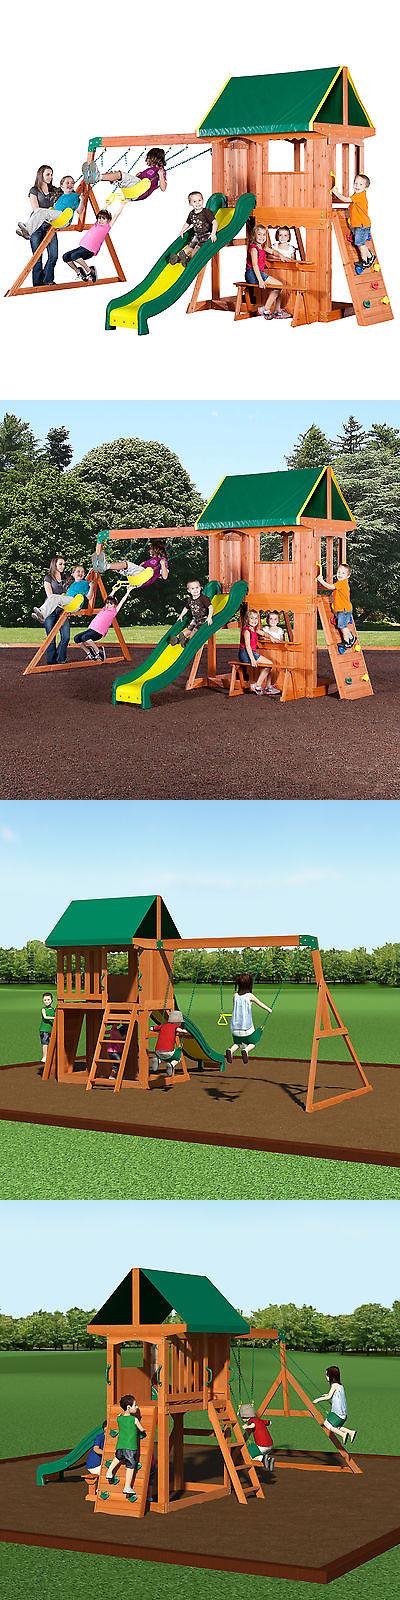 Swings Slides And Gyms 16515: Backyard Discovery Somerset Swing Set  U003e BUY  IT NOW